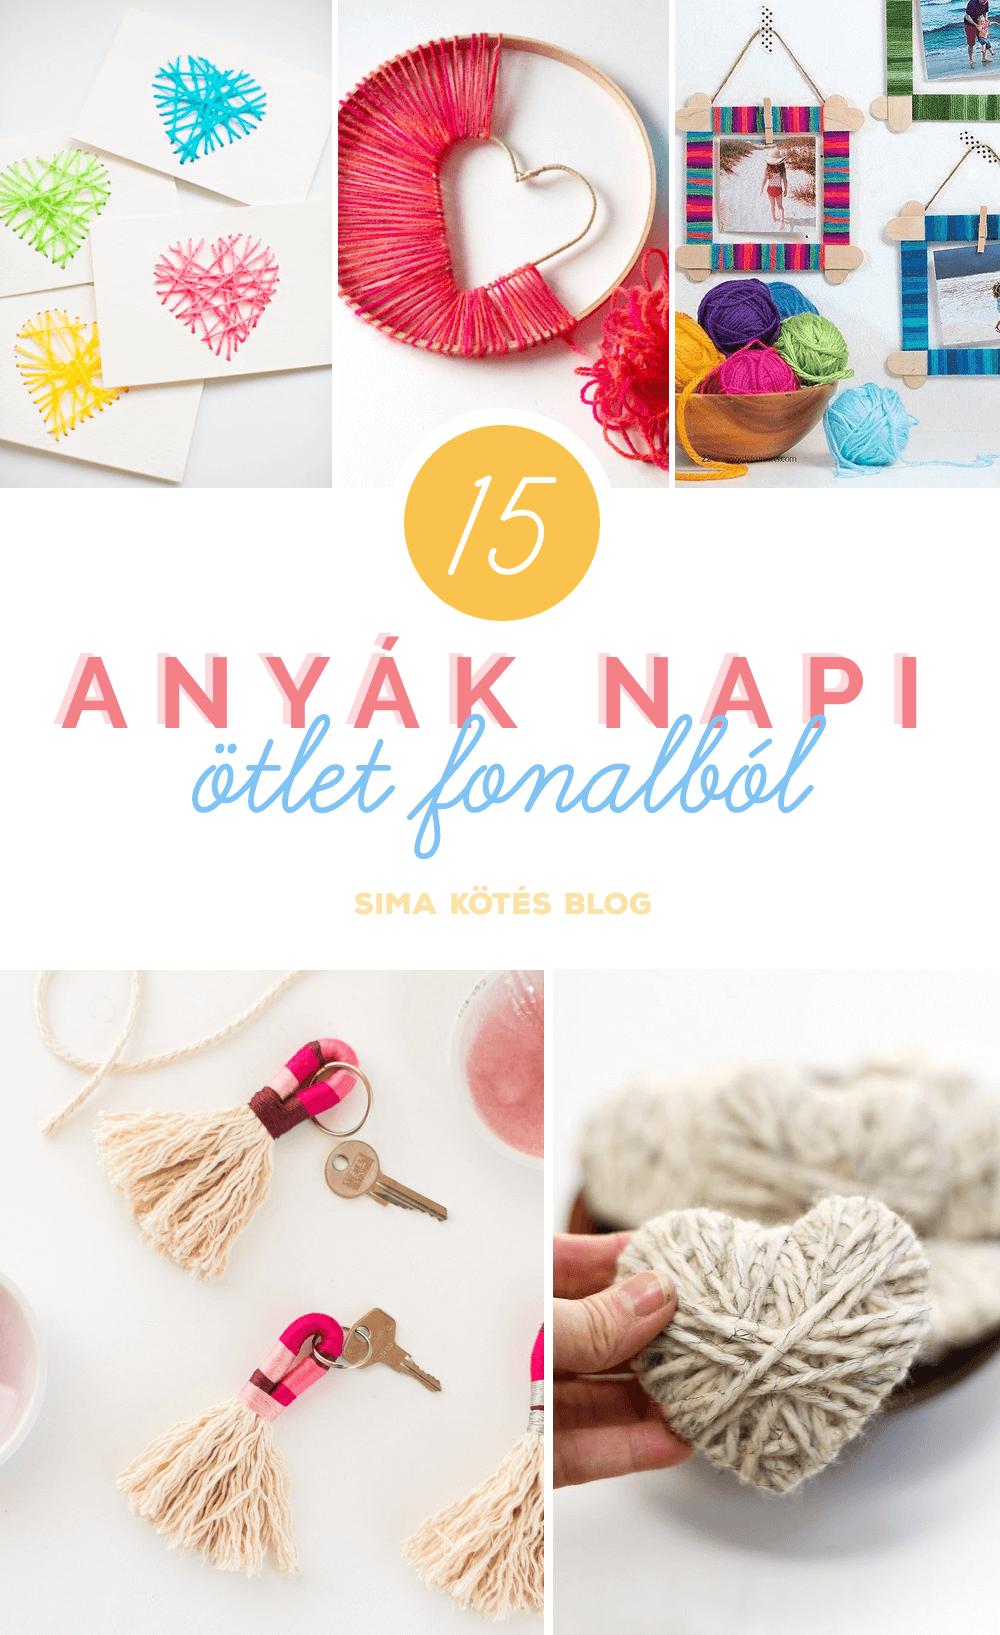 anyak_napja_01.png